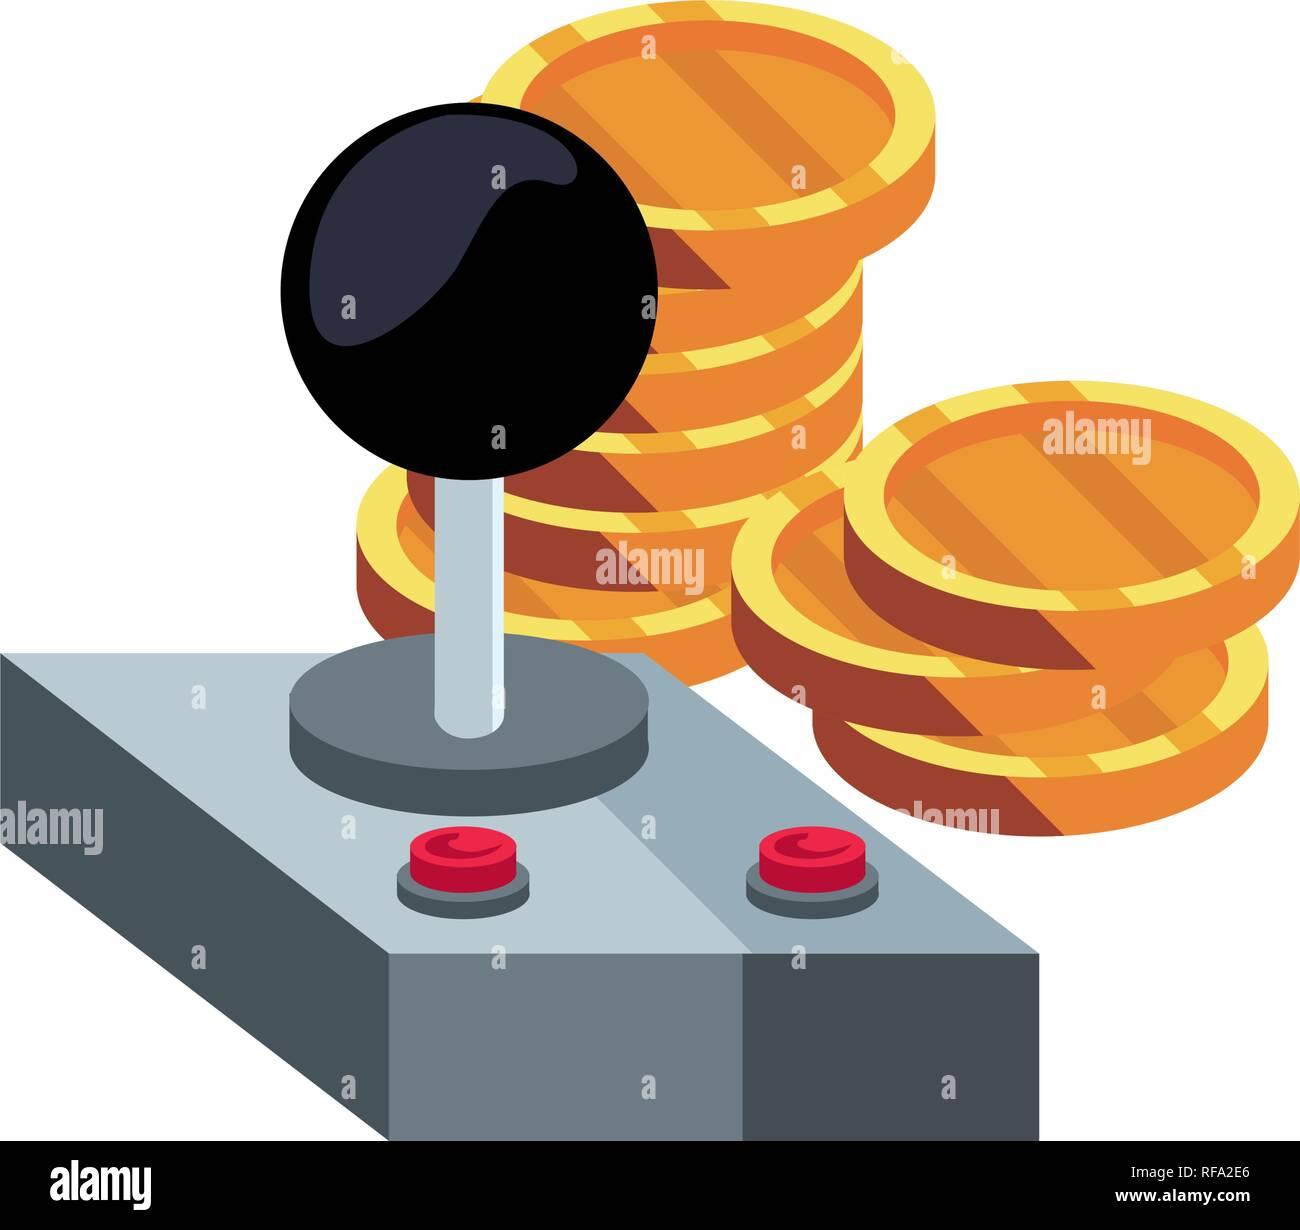 joystick video game coins background vector illustration - Stock Image